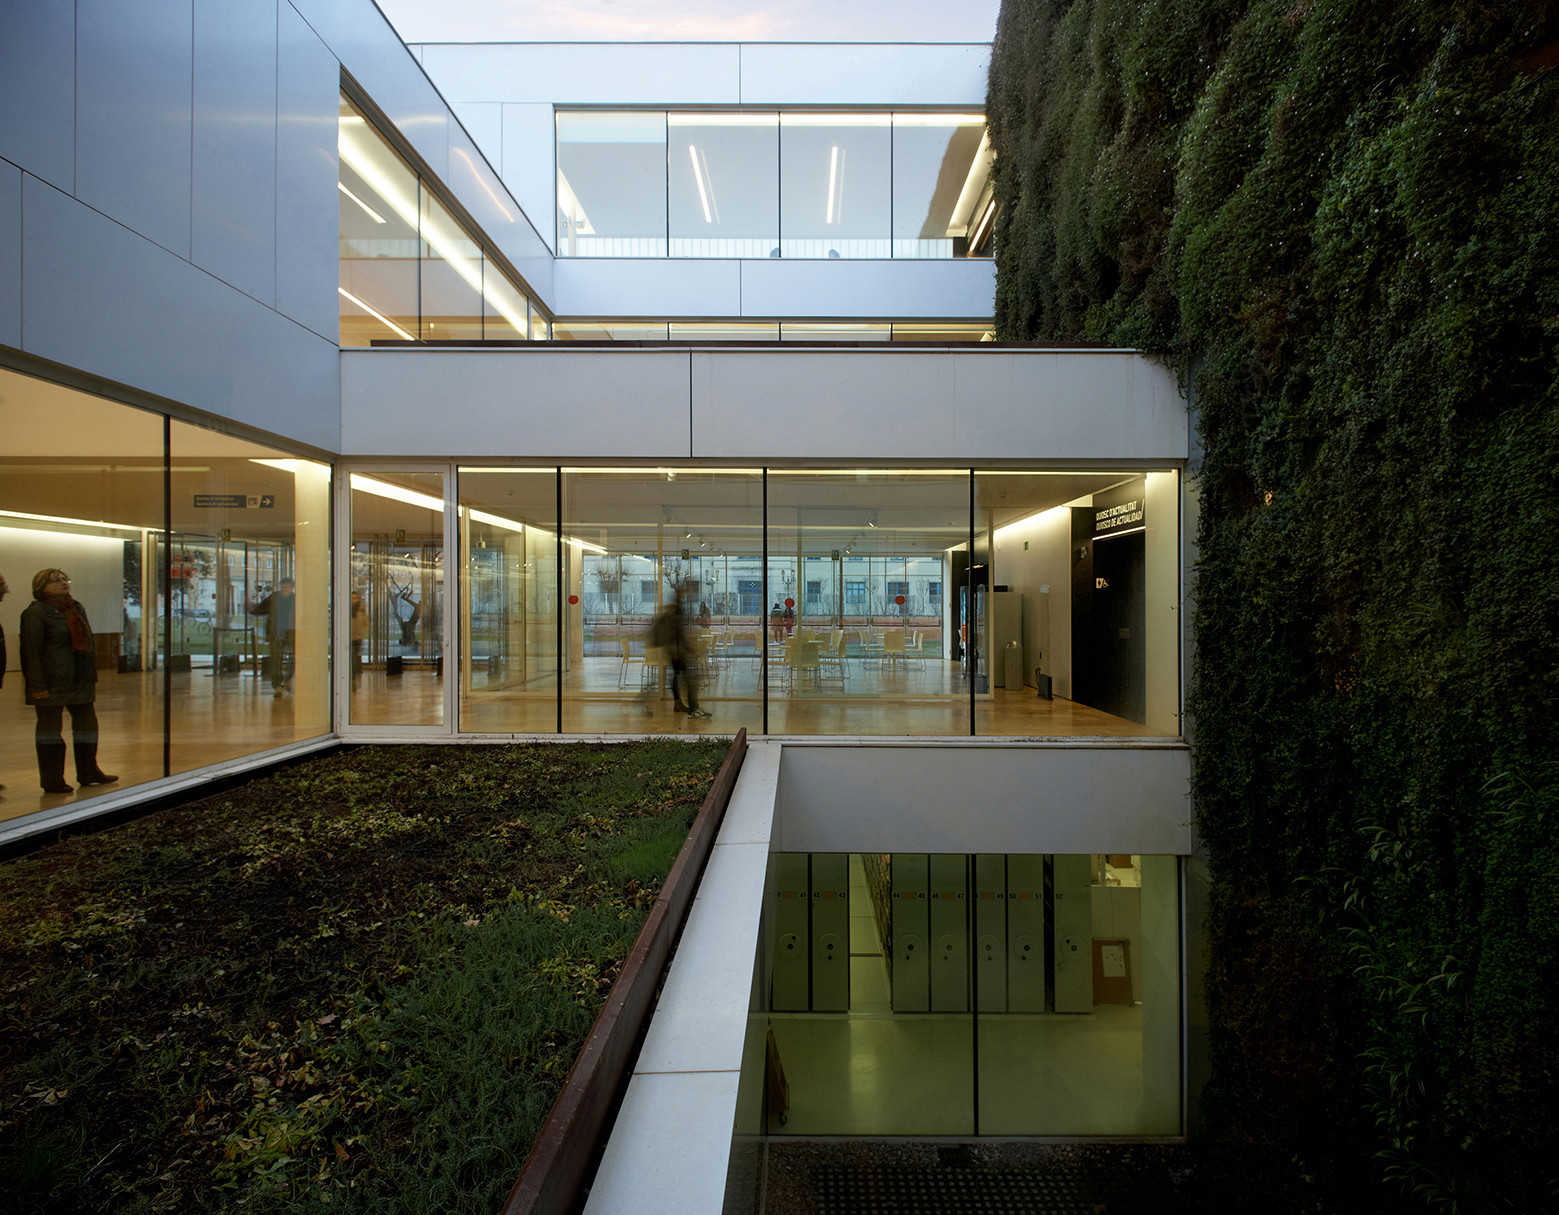 Biblioteca Pública de Girona / Corea & Moran Arquitectura, © Pepo Segura